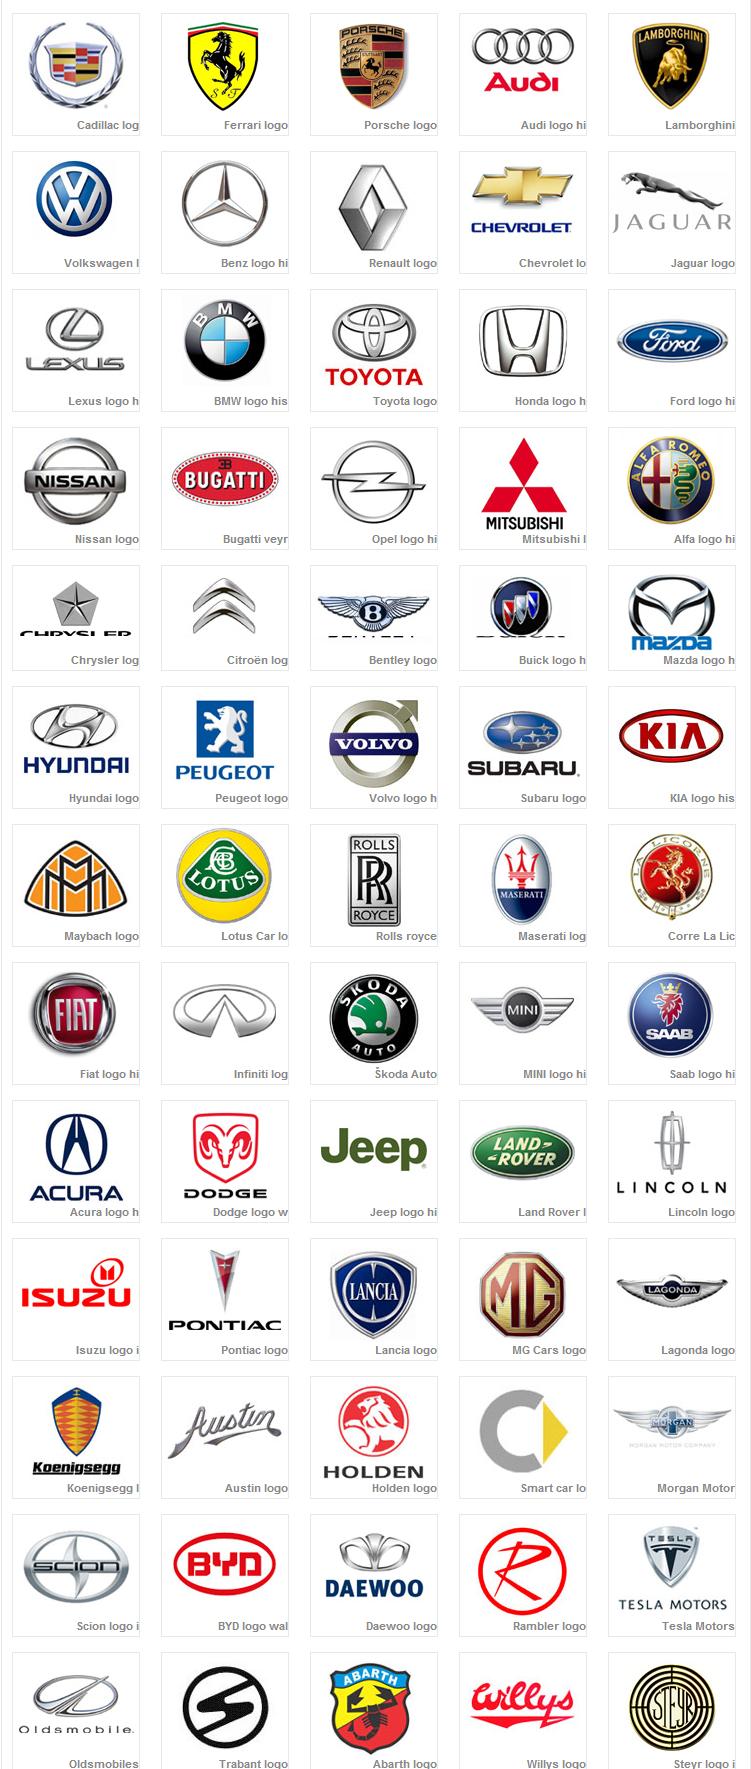 Car Logos Car Symbols Car Brands Logos Car Brands